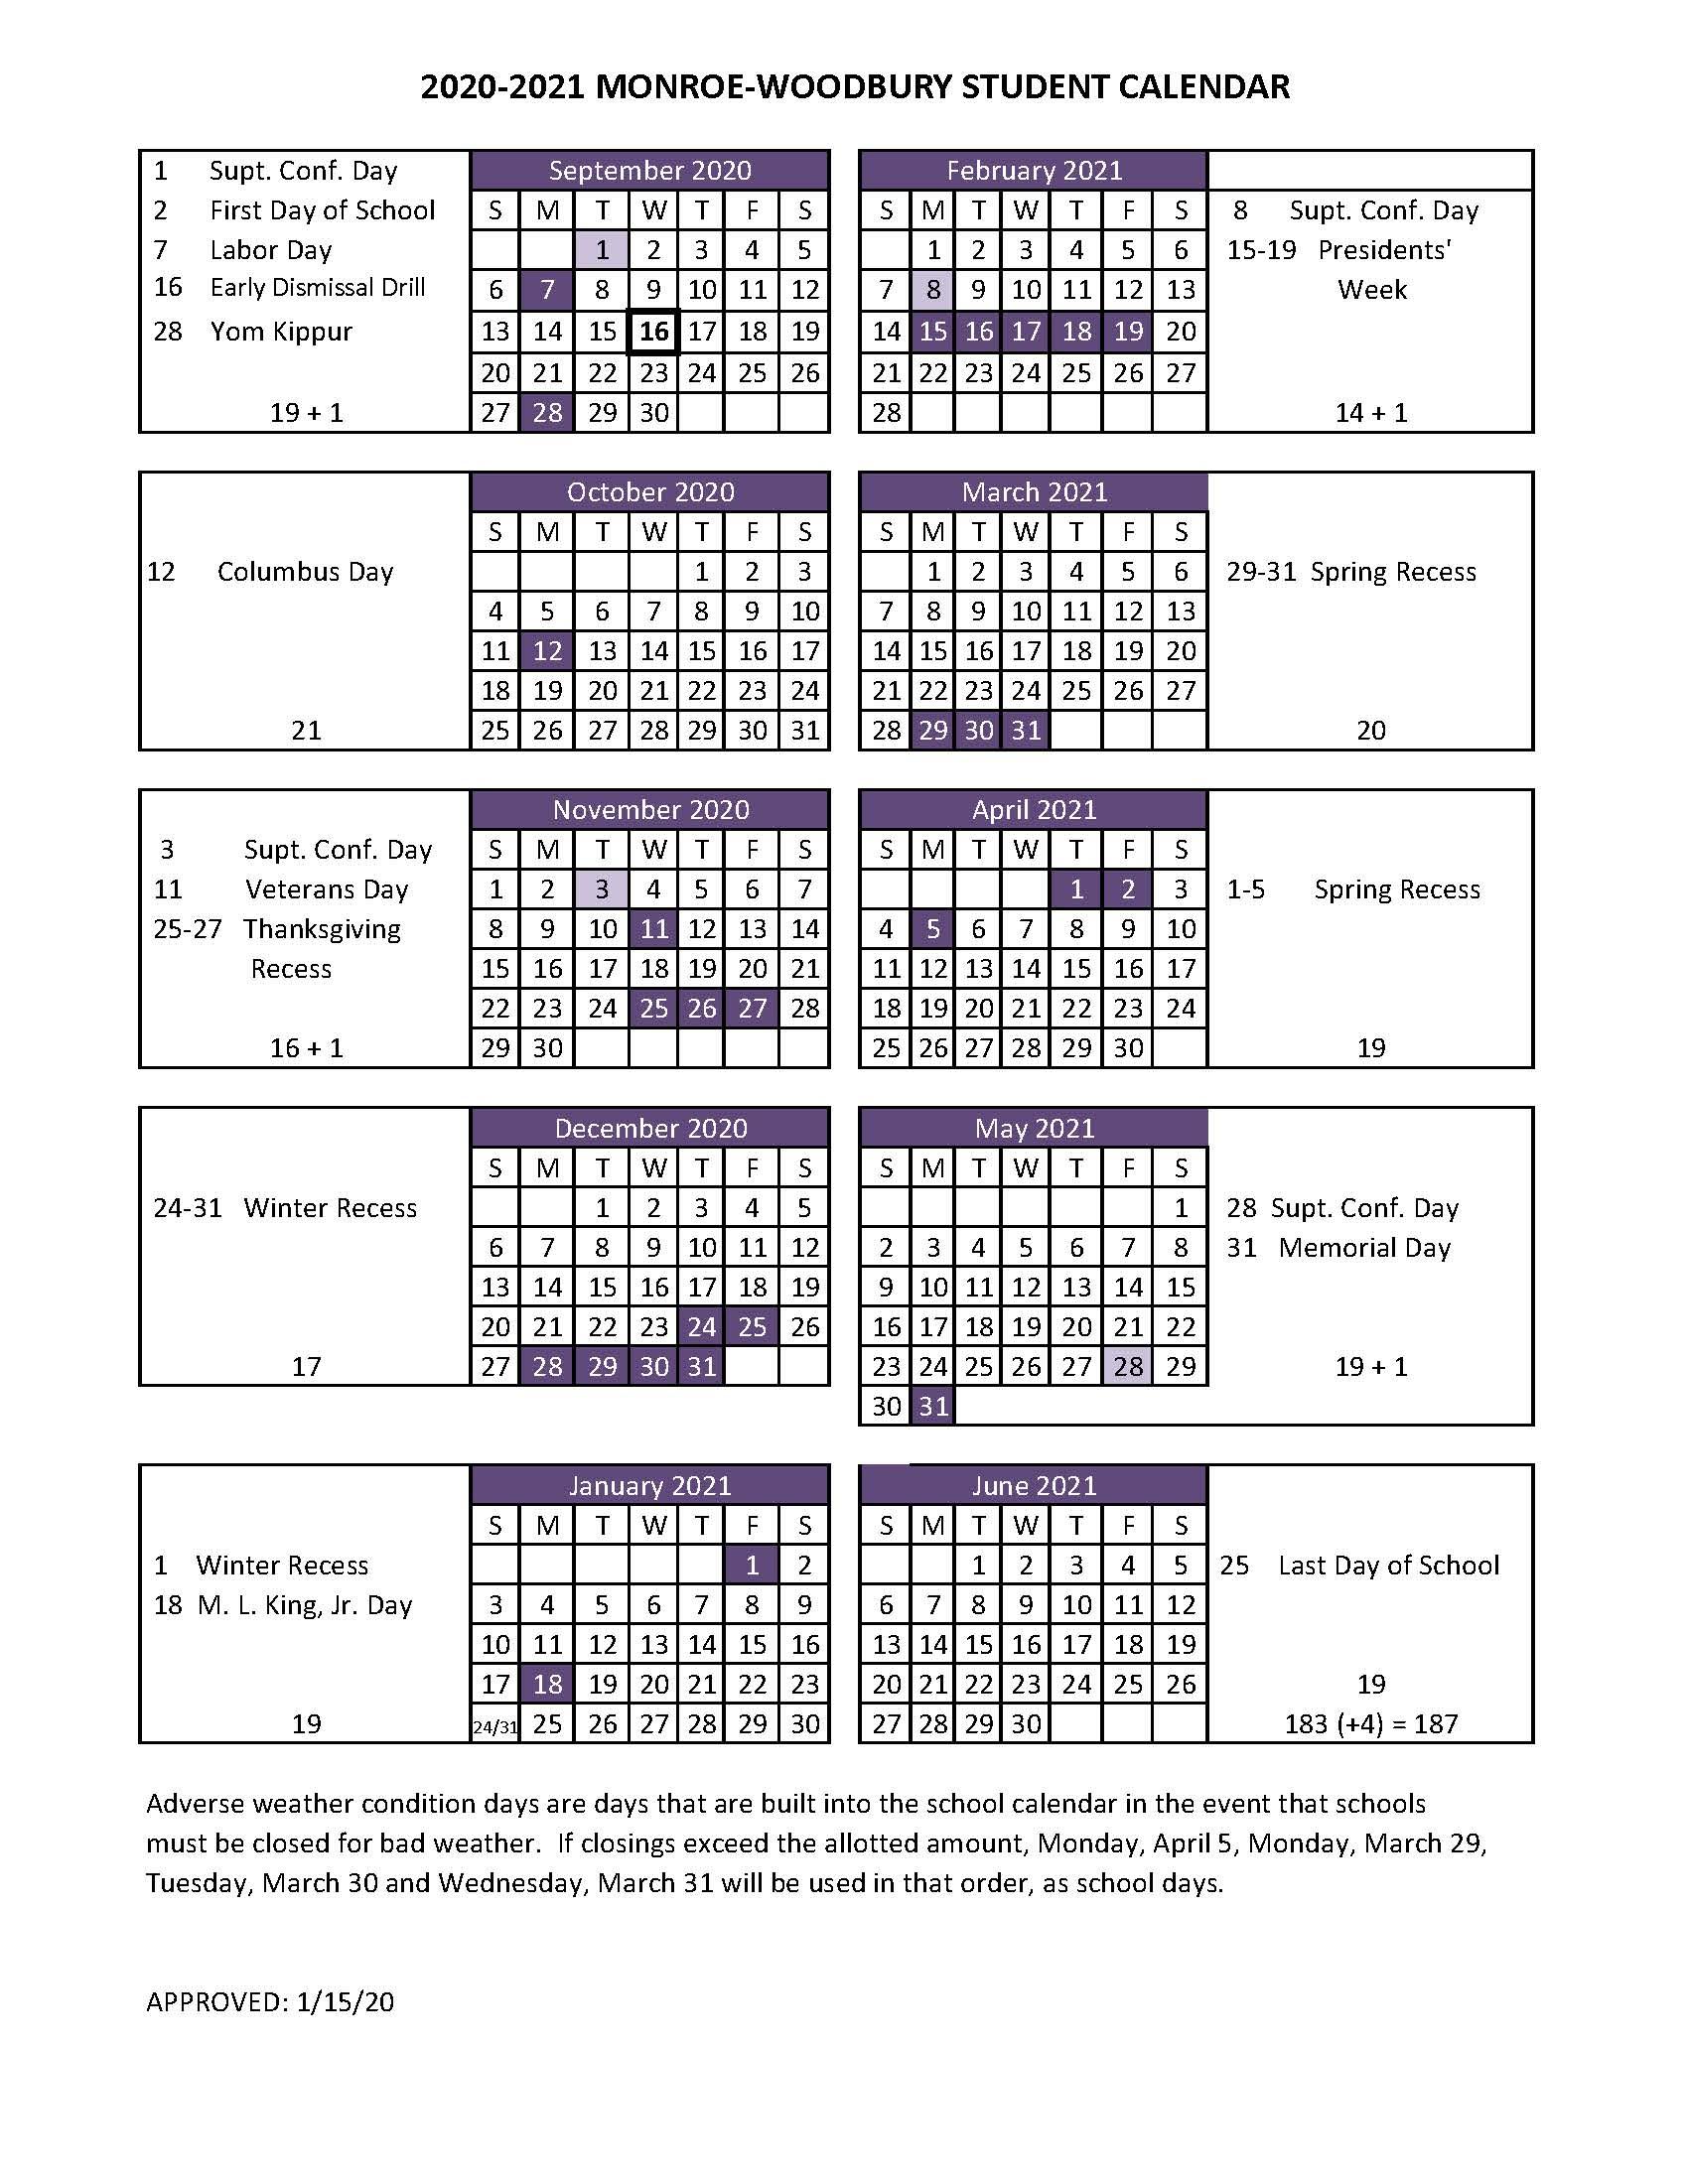 2020 2021 Student Calendar – Monroe Woodbury Central School Within Board Of Education Calendar Nyc